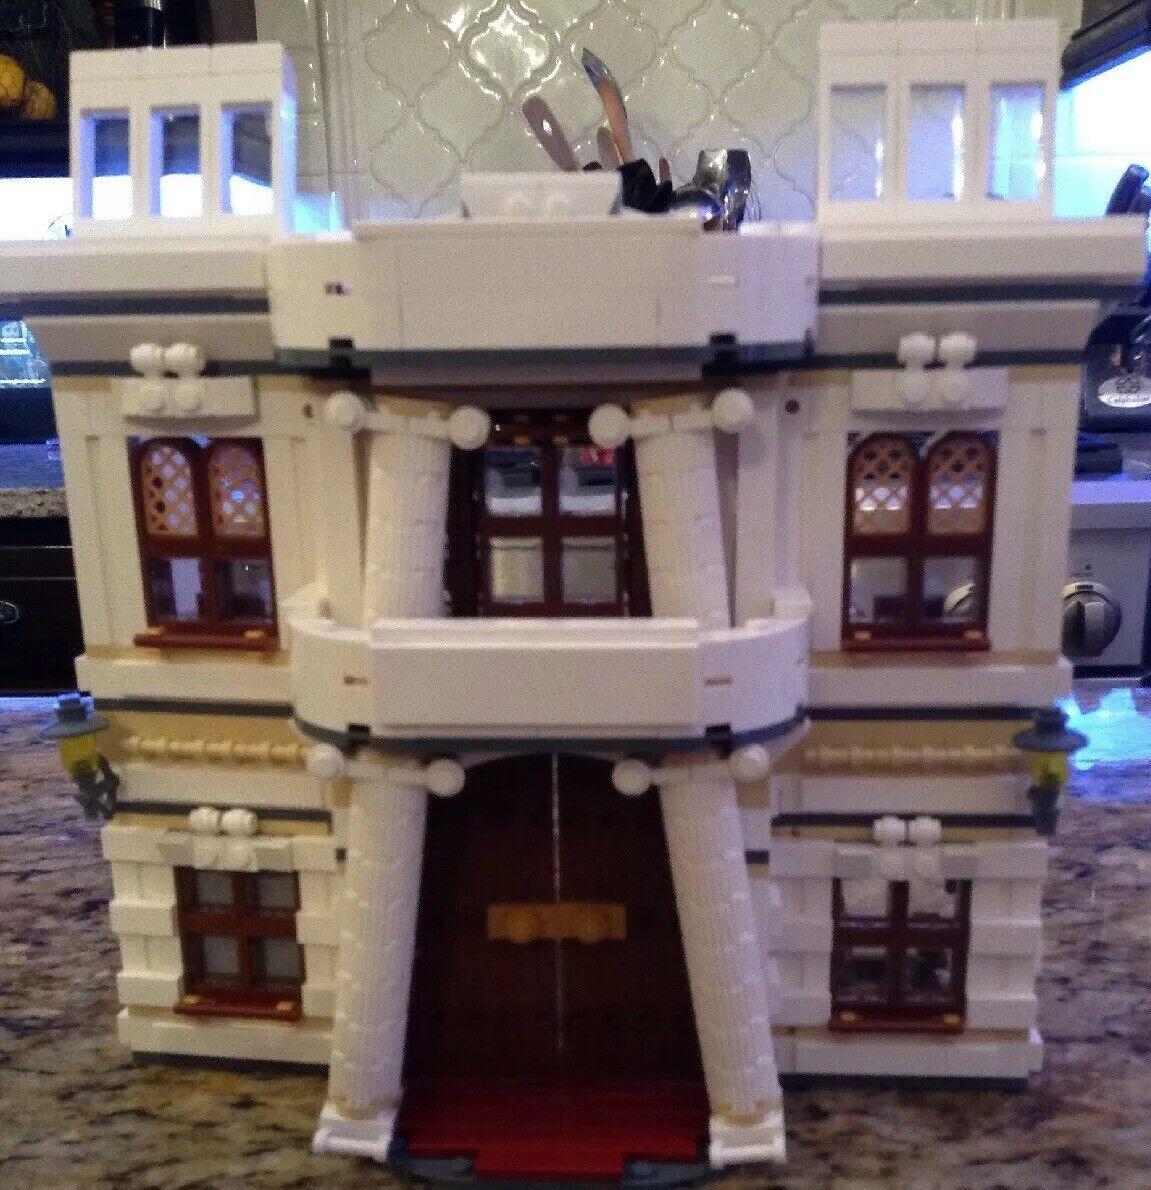 Lego Harry Potter Potter Potter Diagon Alley 10217 8c7744